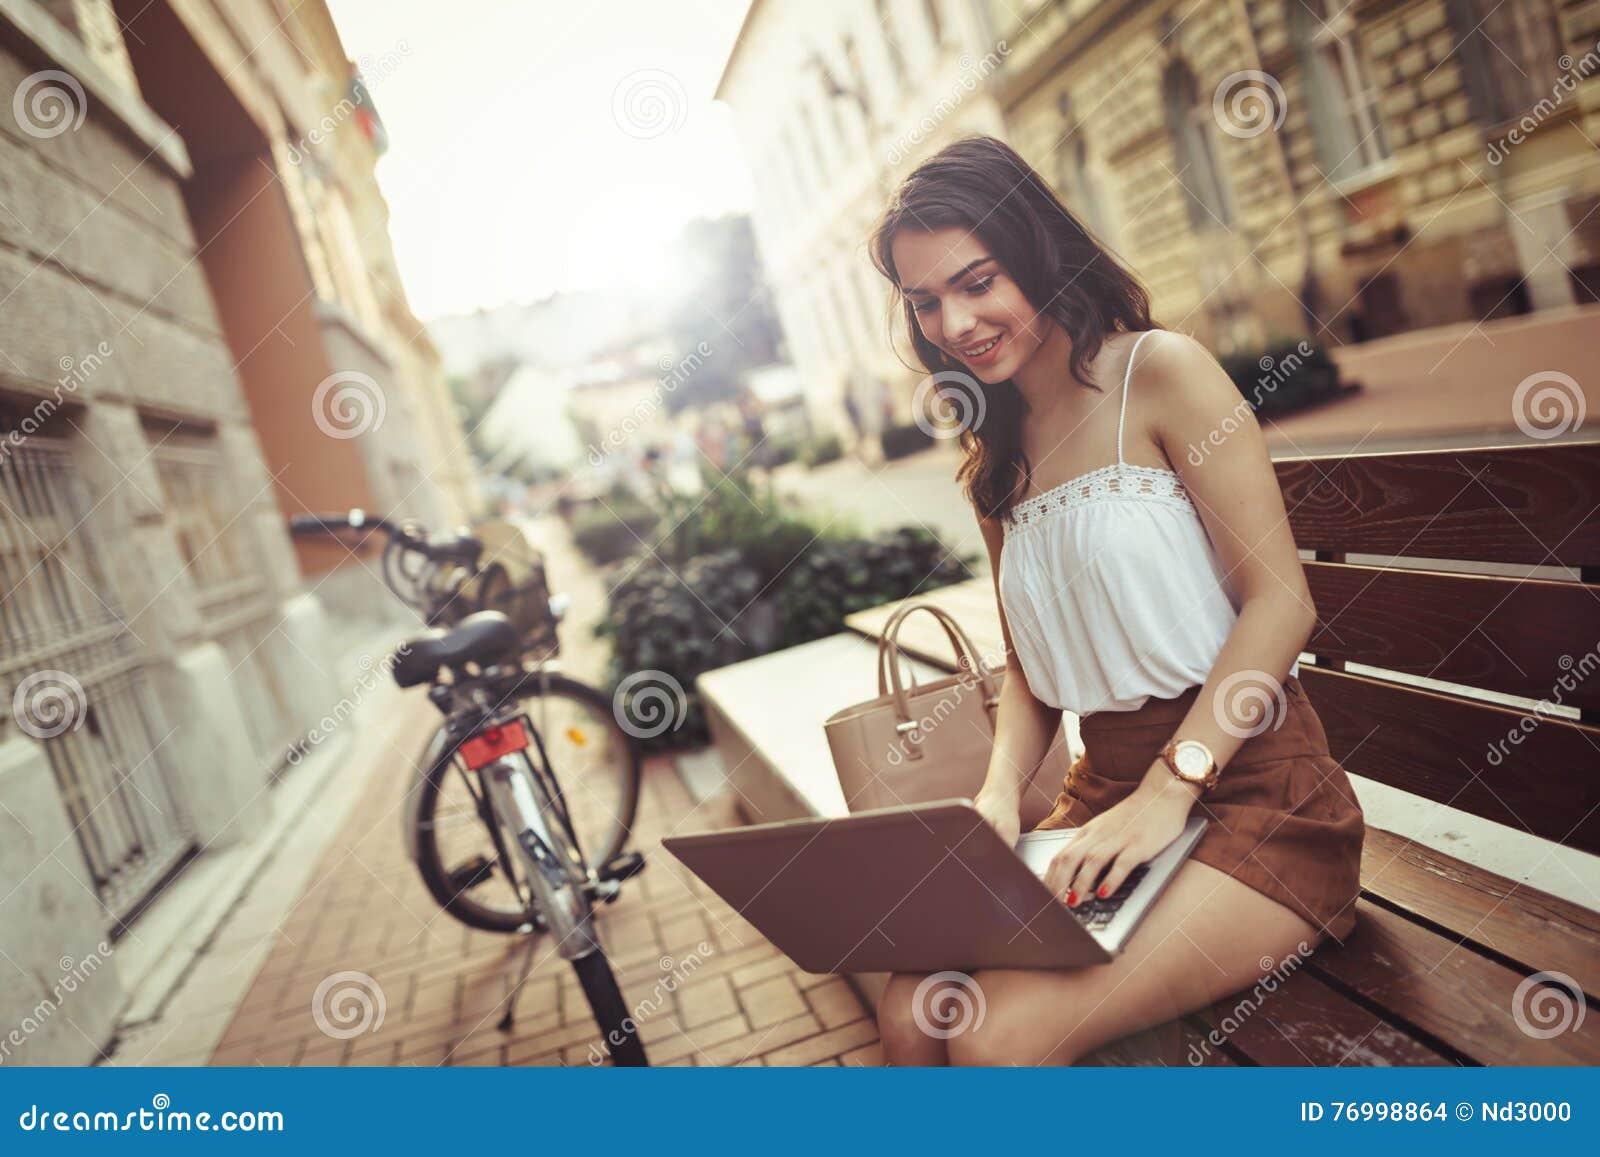 Beautiful woman using laptop outdoors